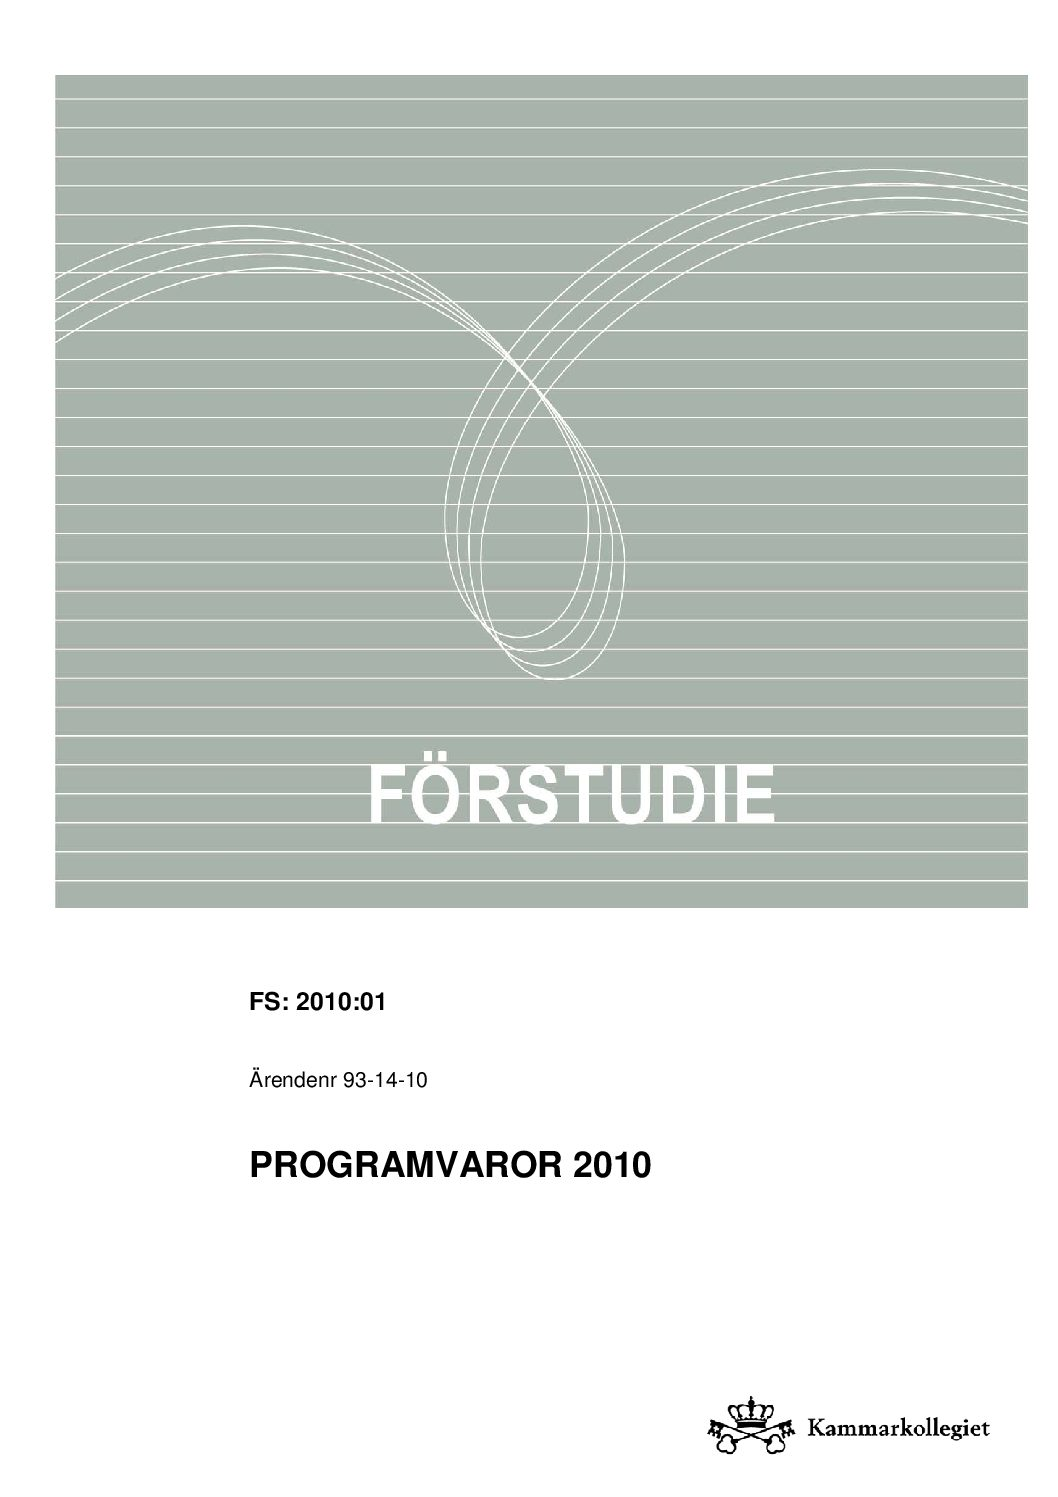 Förstudie Programvaror 2010